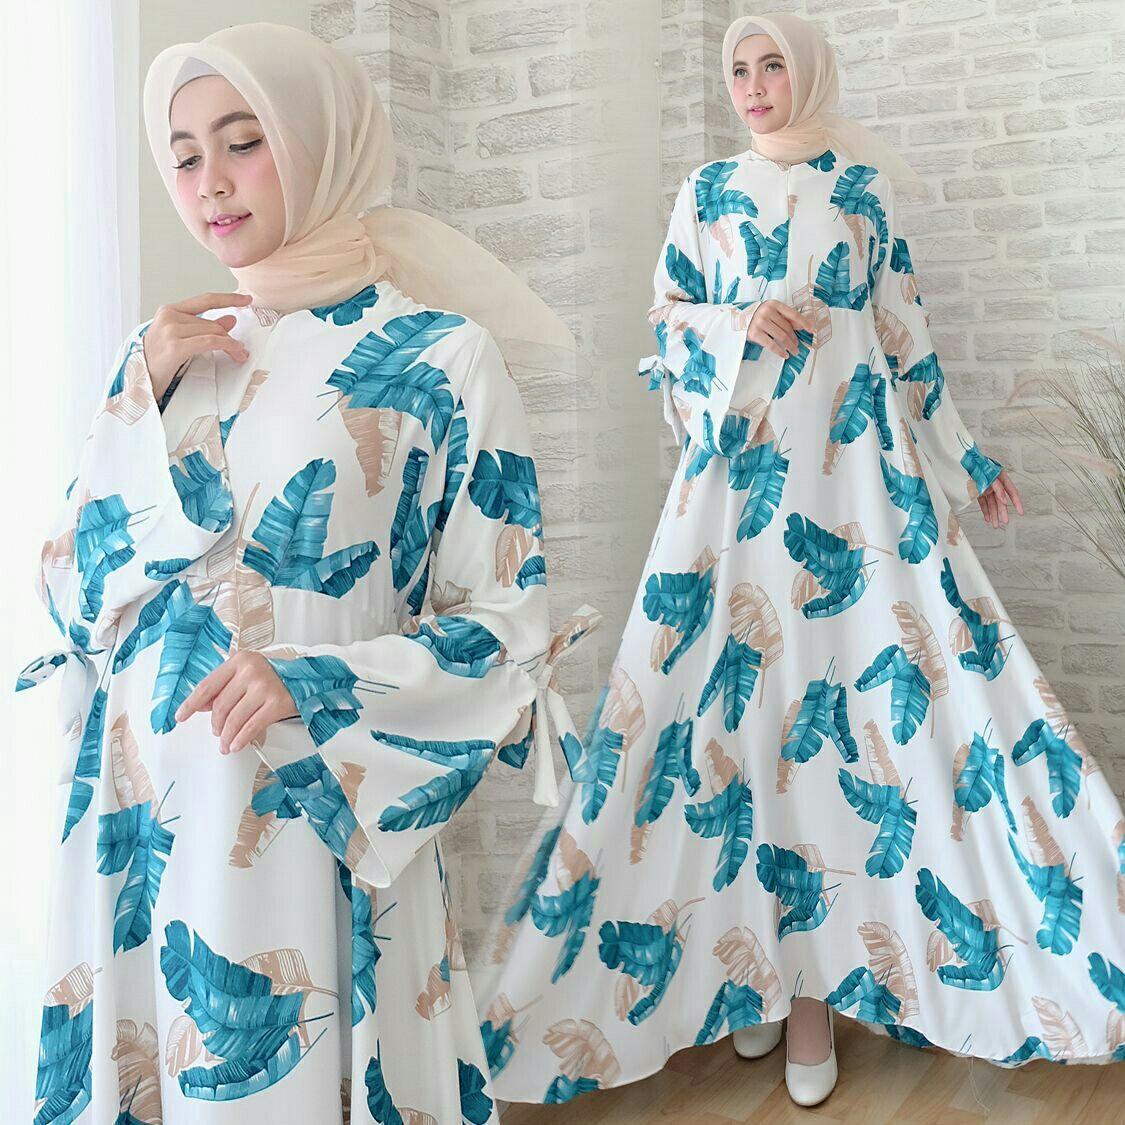 Baju Muslim Wanita / Longdress Jumbo XXL / Gamis Bigsize / Busui / Maxi Amika